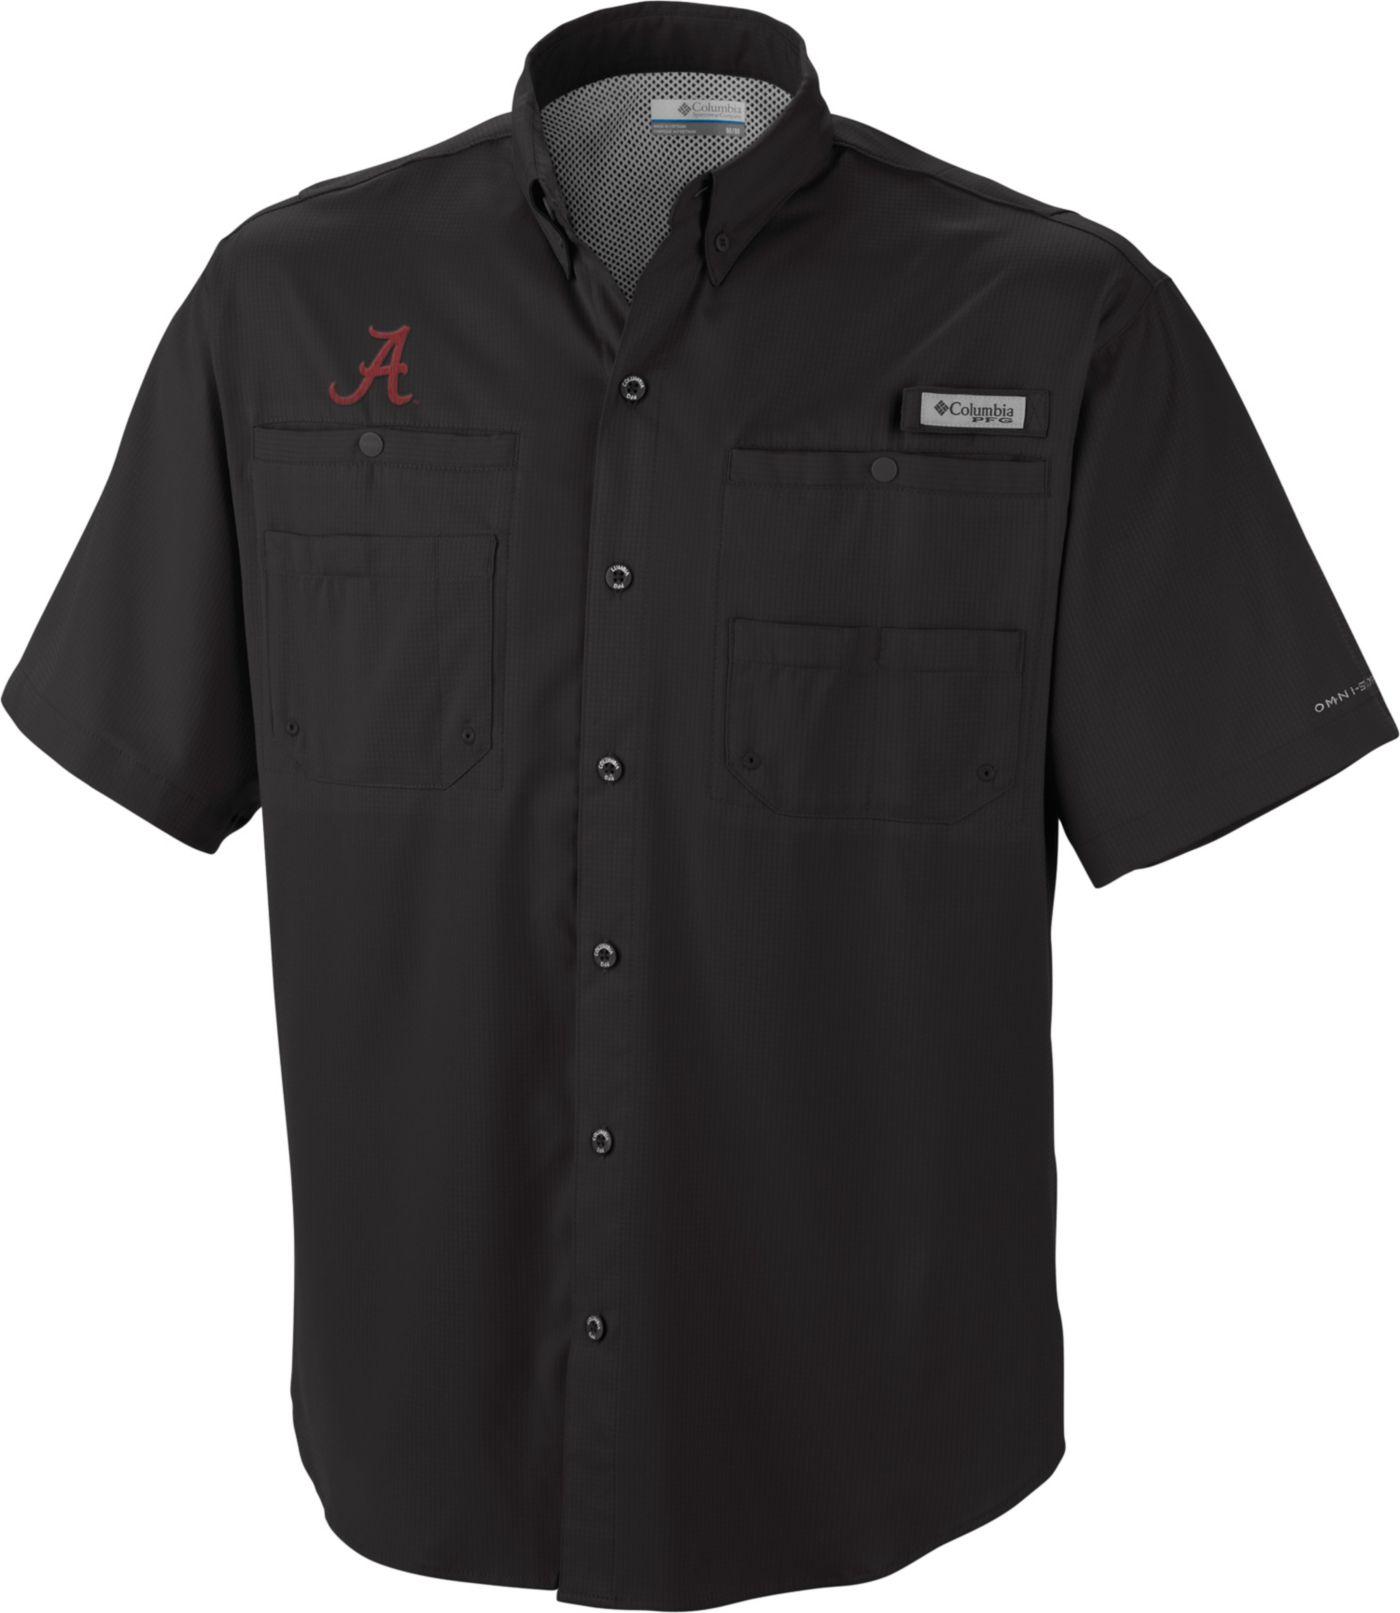 Columbia Men's Alabama Crimson Tide Black Tamiami Performance Shirt